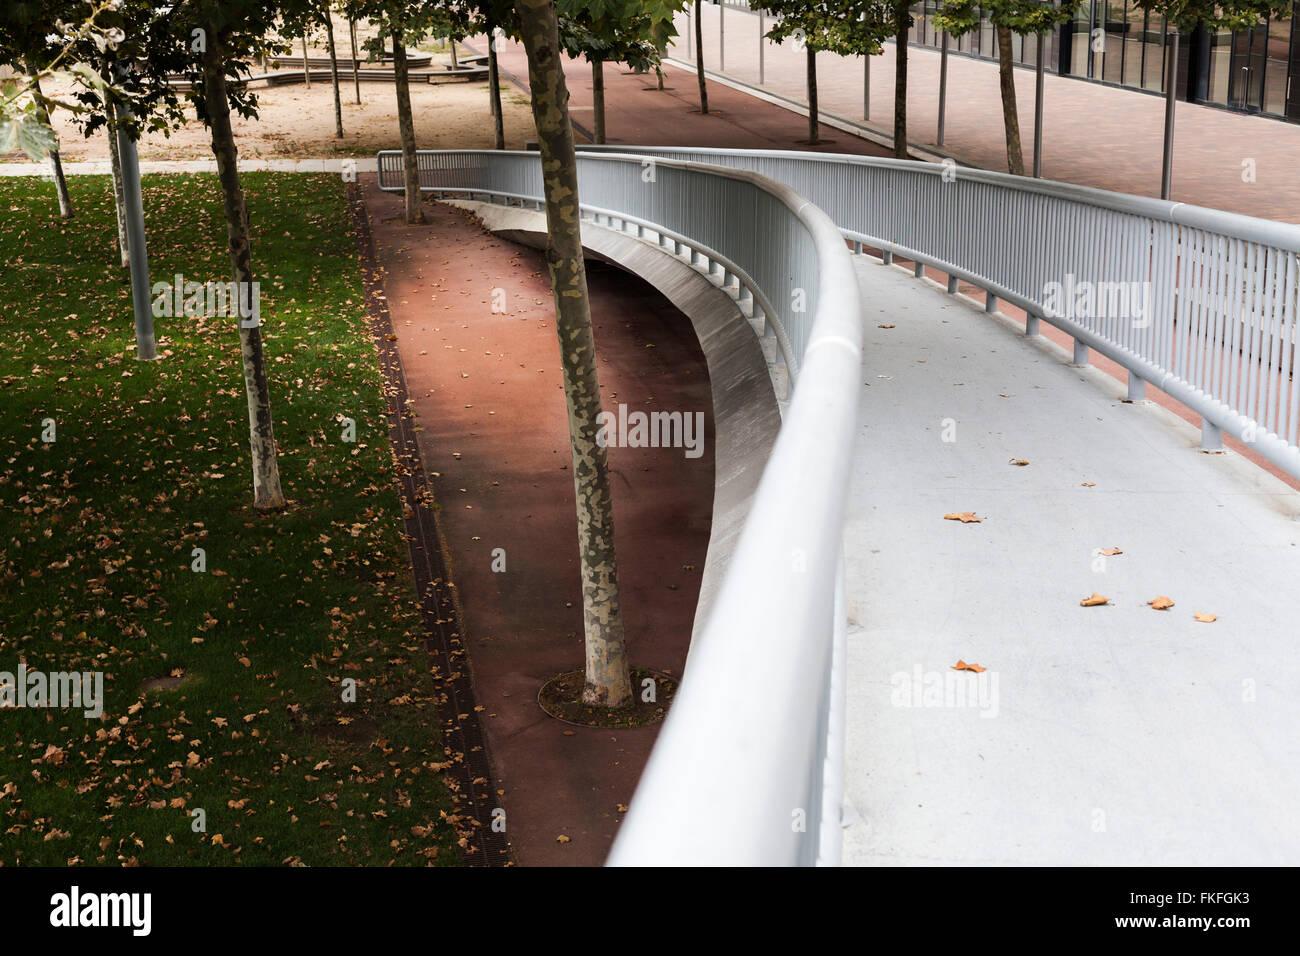 El Parc del Forum de Barcelona. Foto de stock